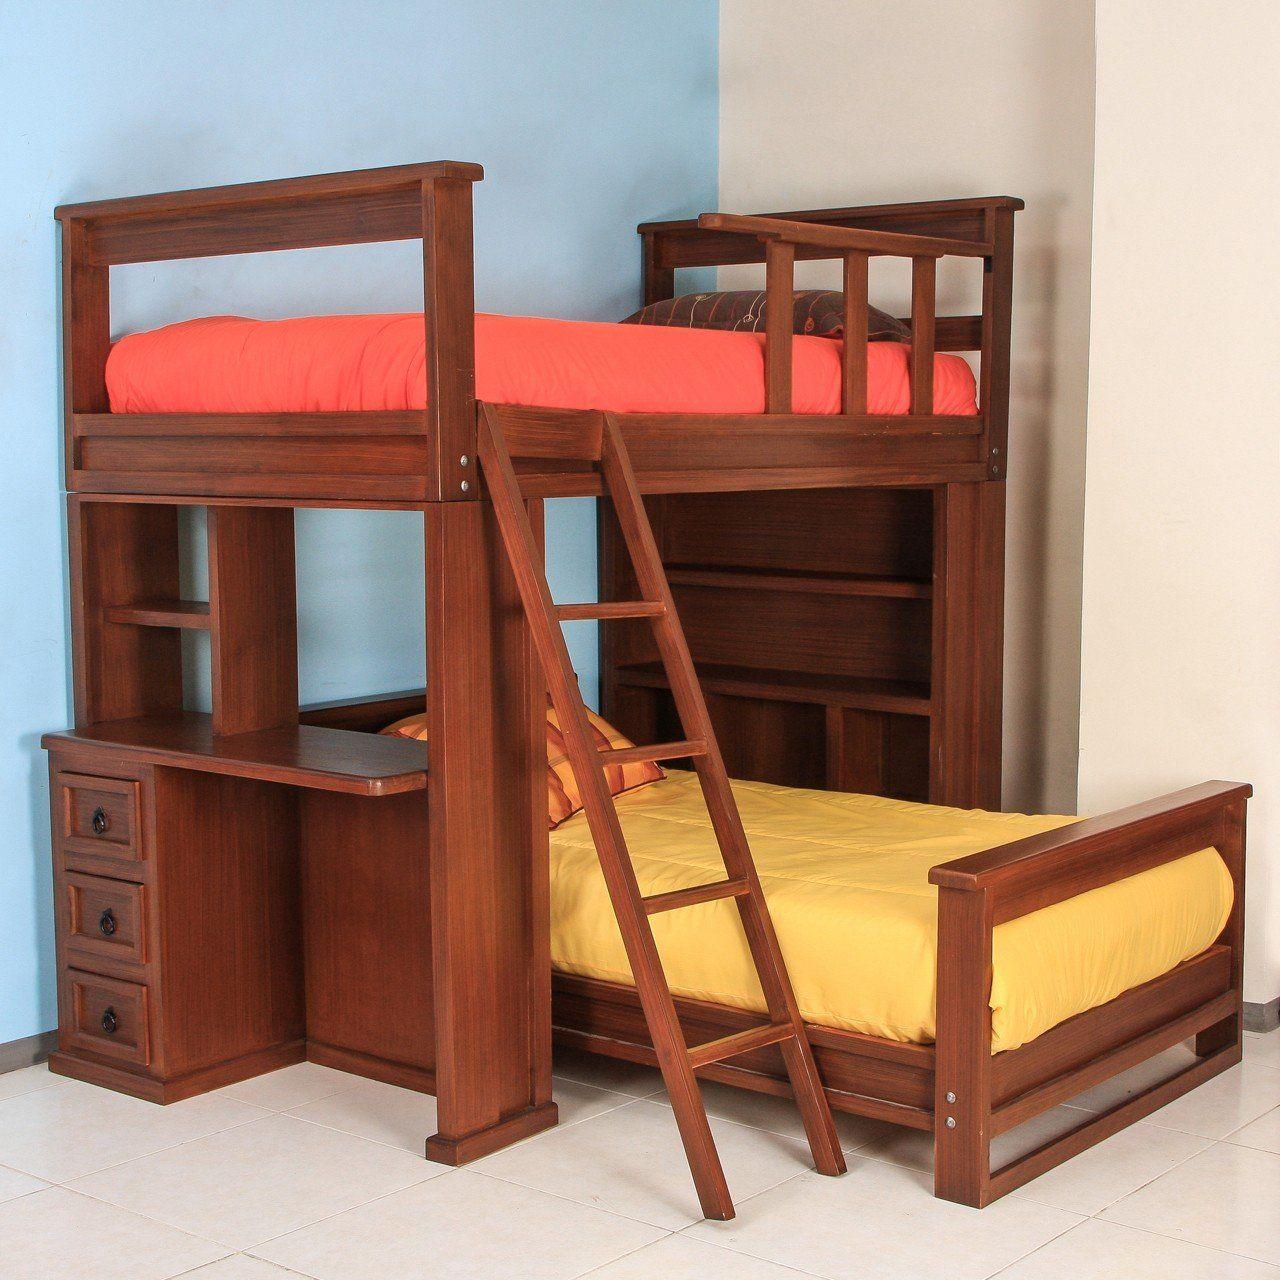 Litera tulum plus modelo tradicional pero con mucho - Diseno de muebles de madera ...